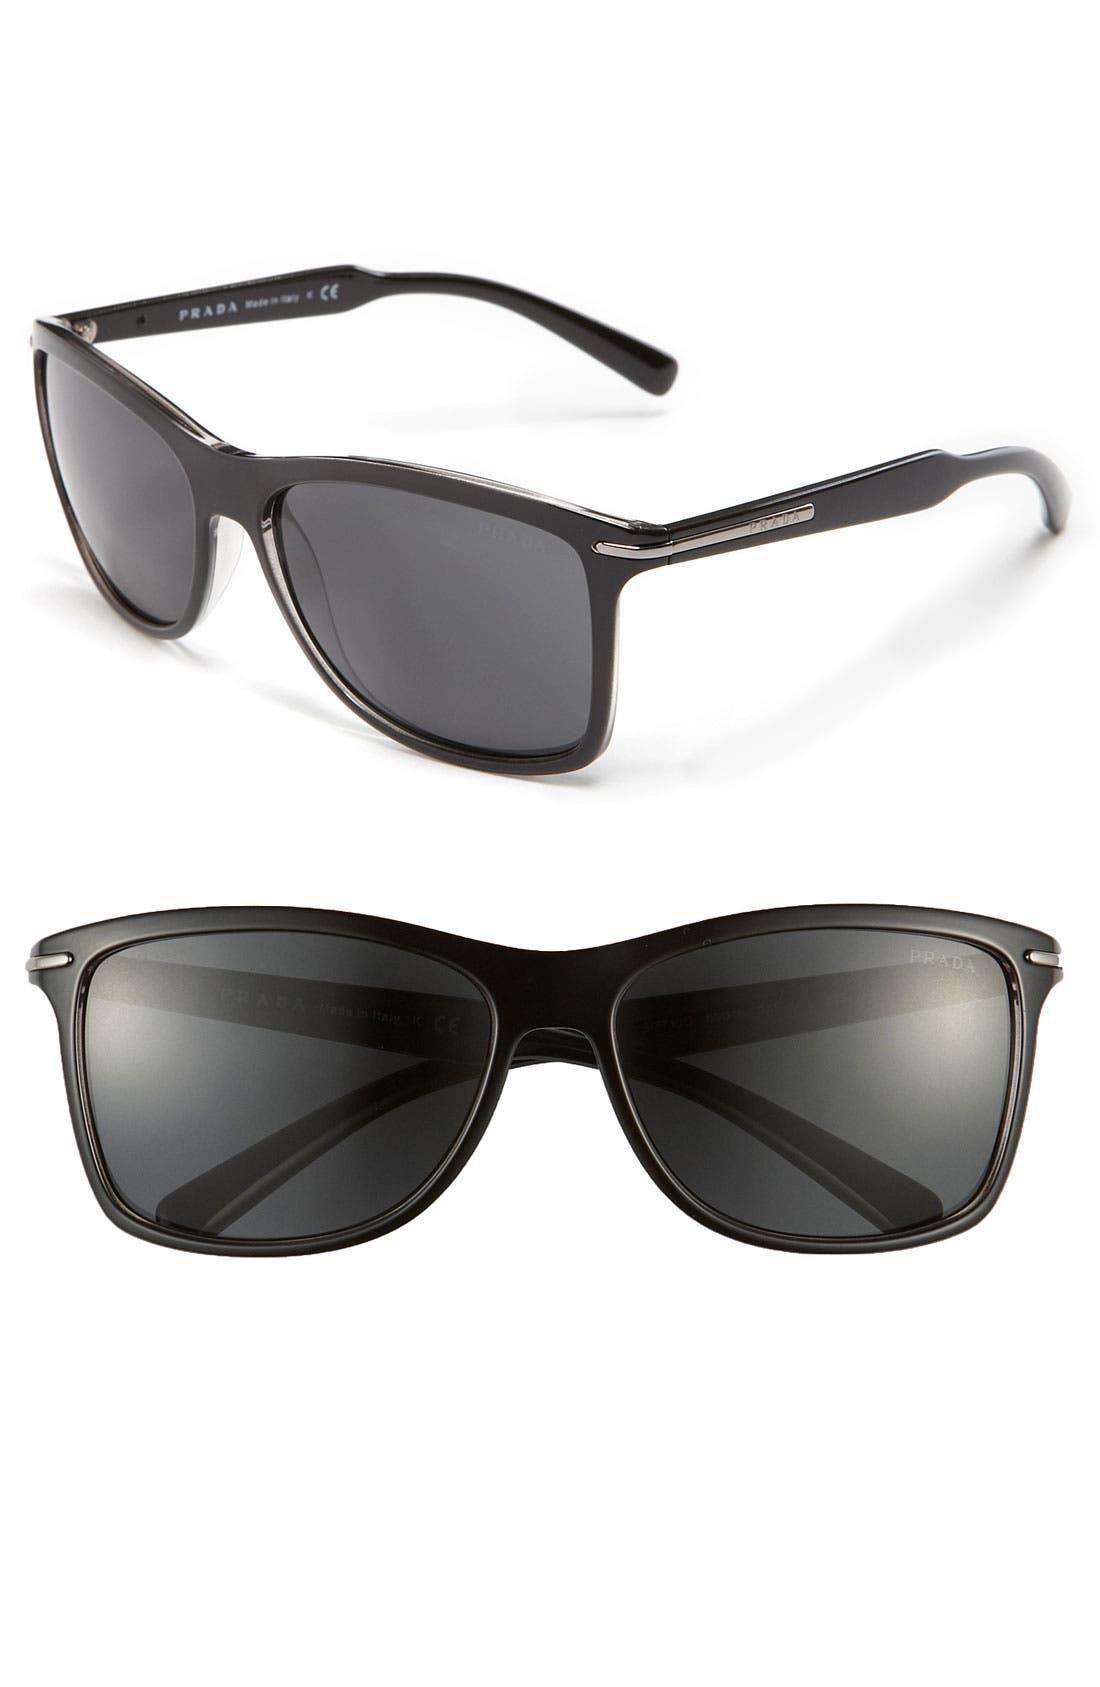 Alternate Image 1 Selected - Prada 'P-Arrow' Retro 60mm Sunglasses